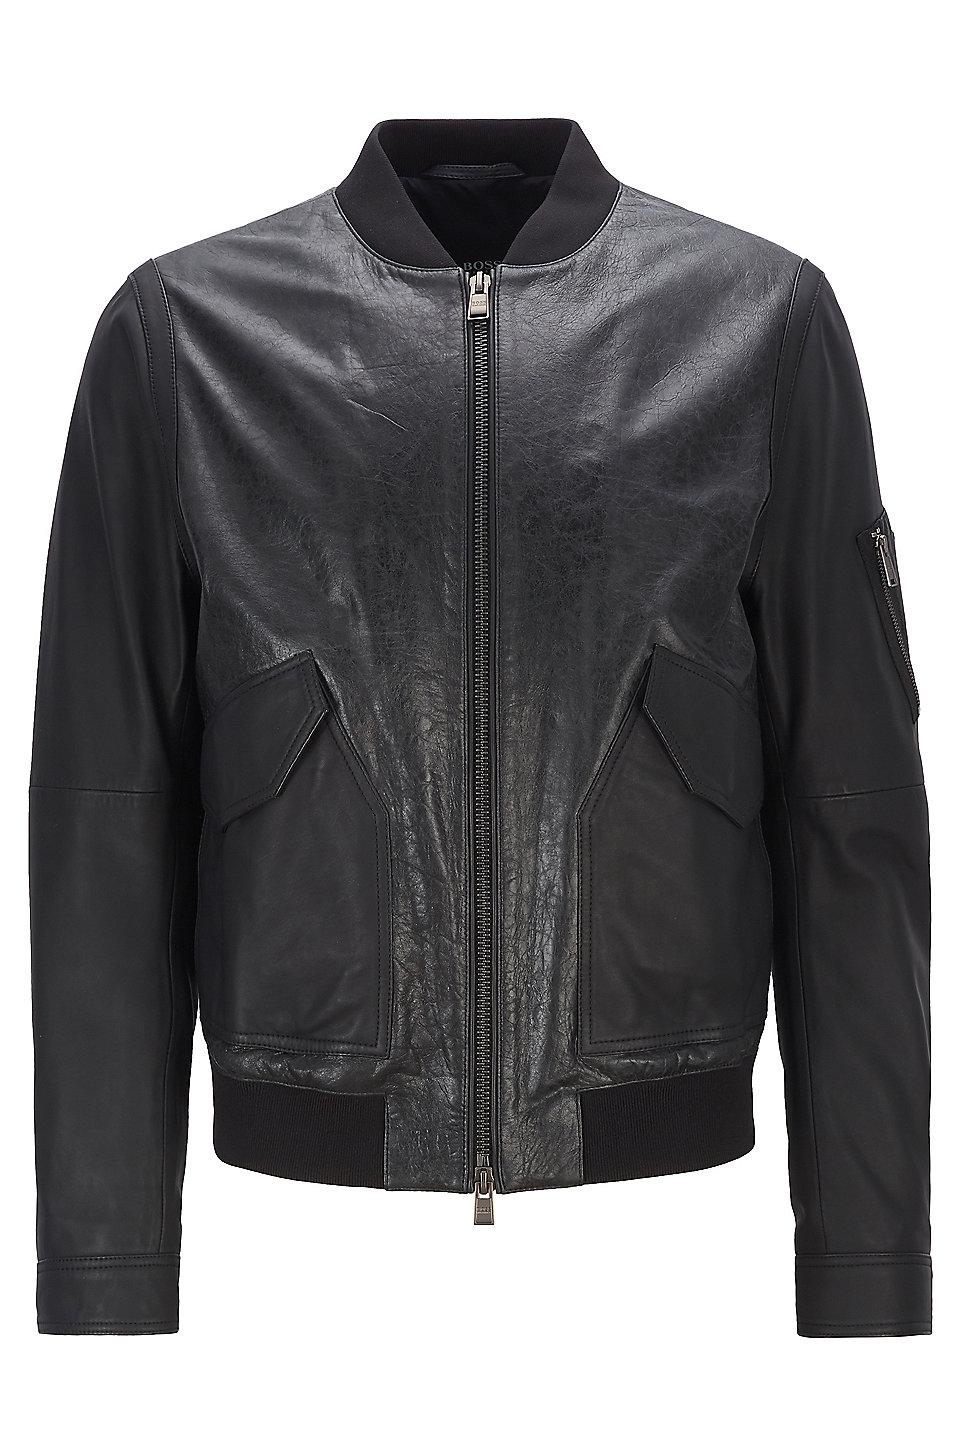 5400b17f9 BOSS - Bomber jacket in mixed nappa leather